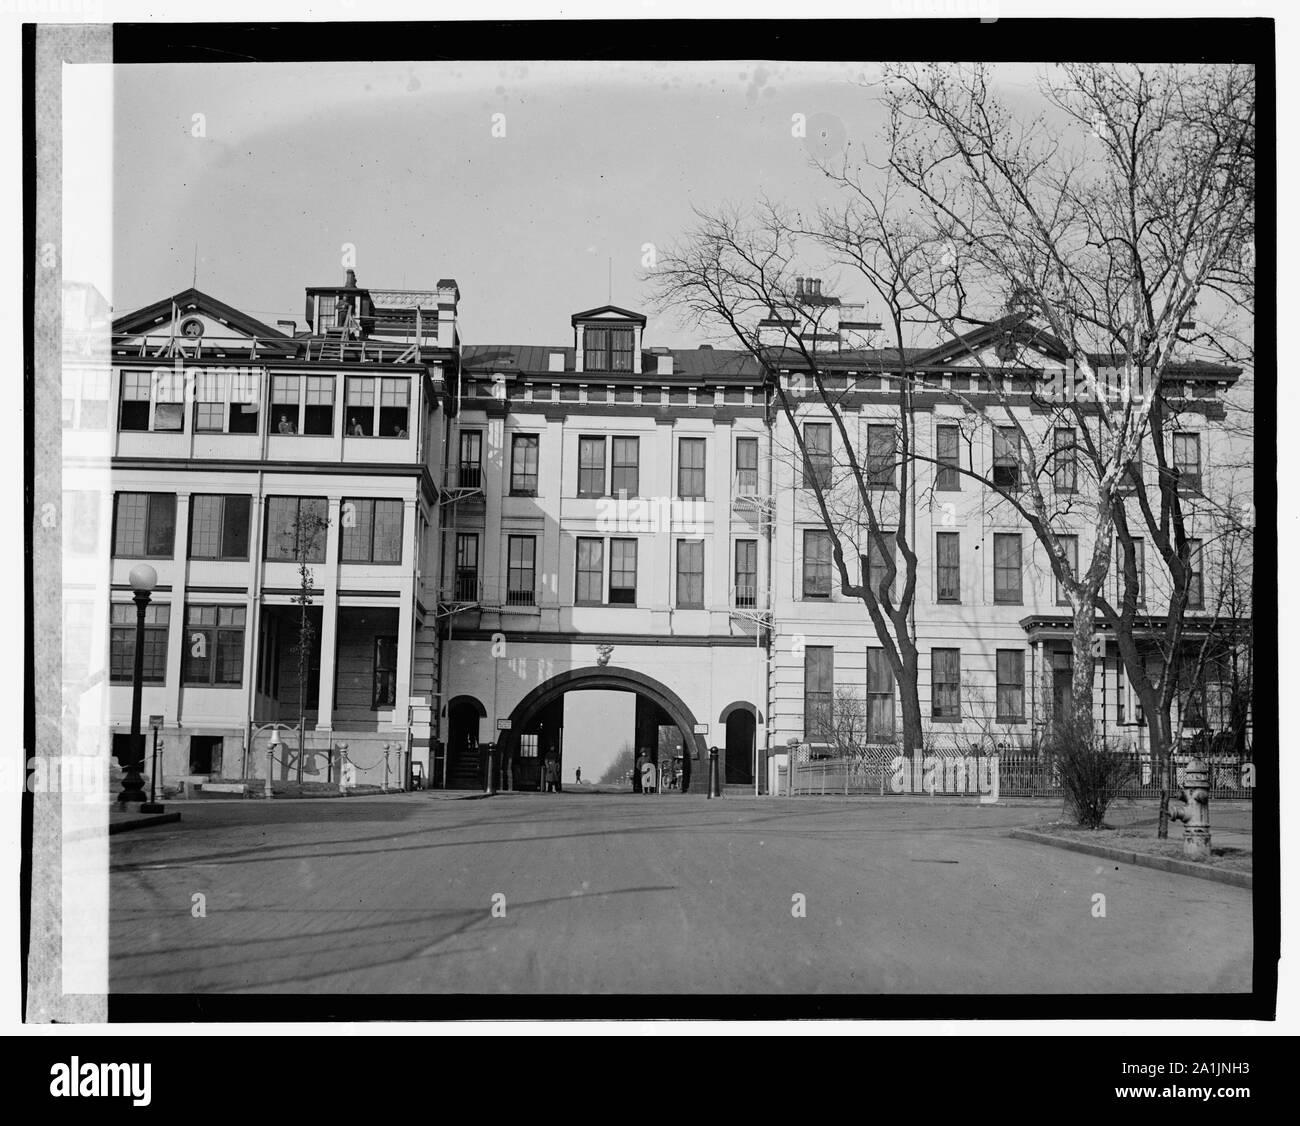 Navy Yard gate Stock Photo